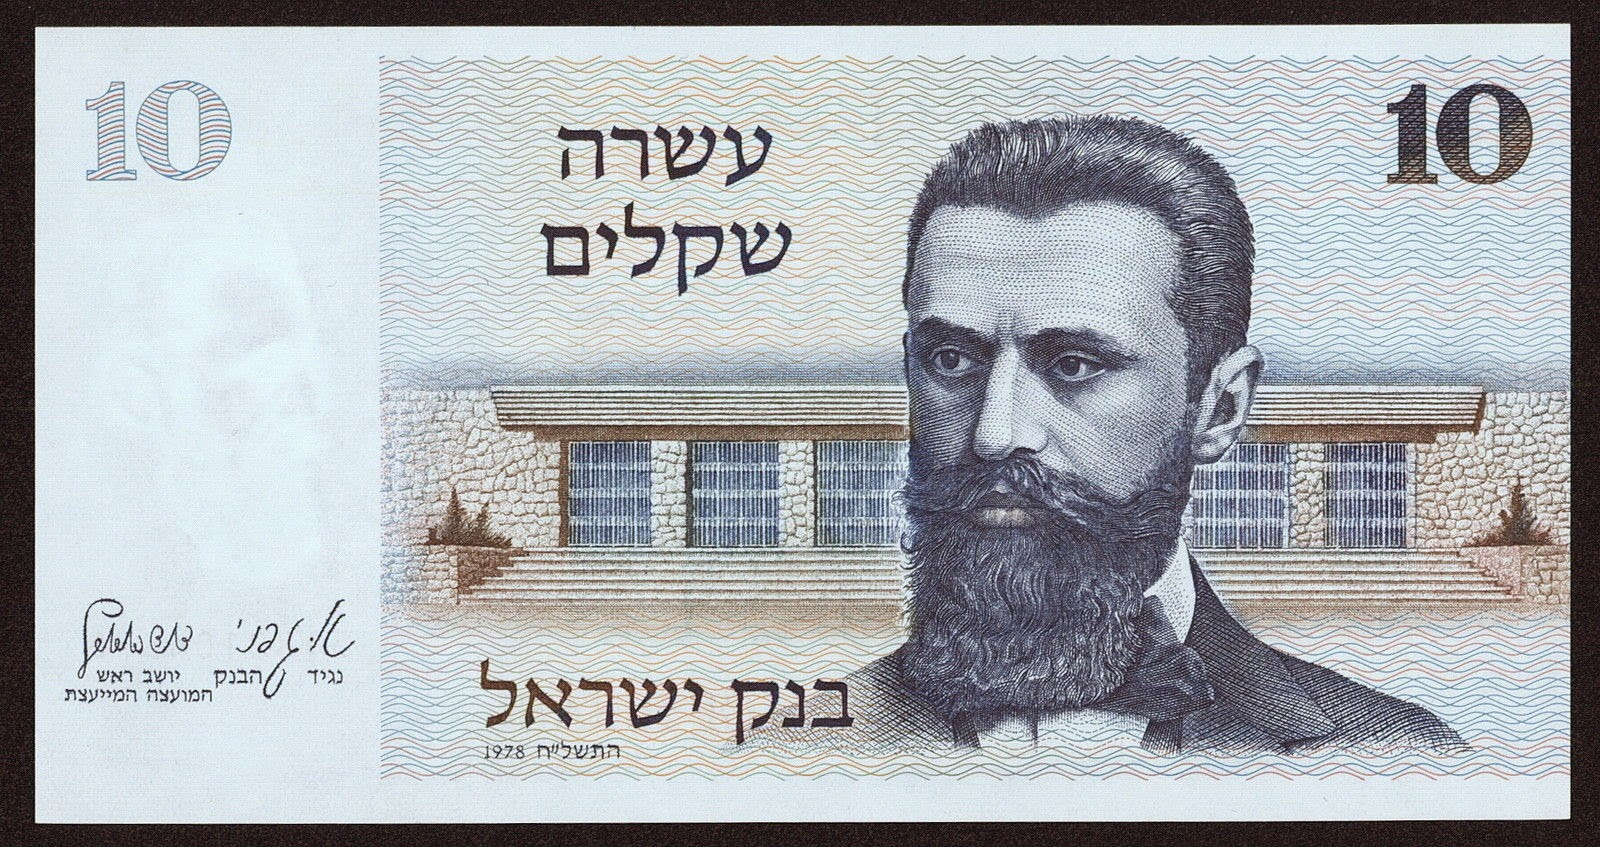 Israel banknotes 10 Sheqalim note 1978 Theodor Herzl